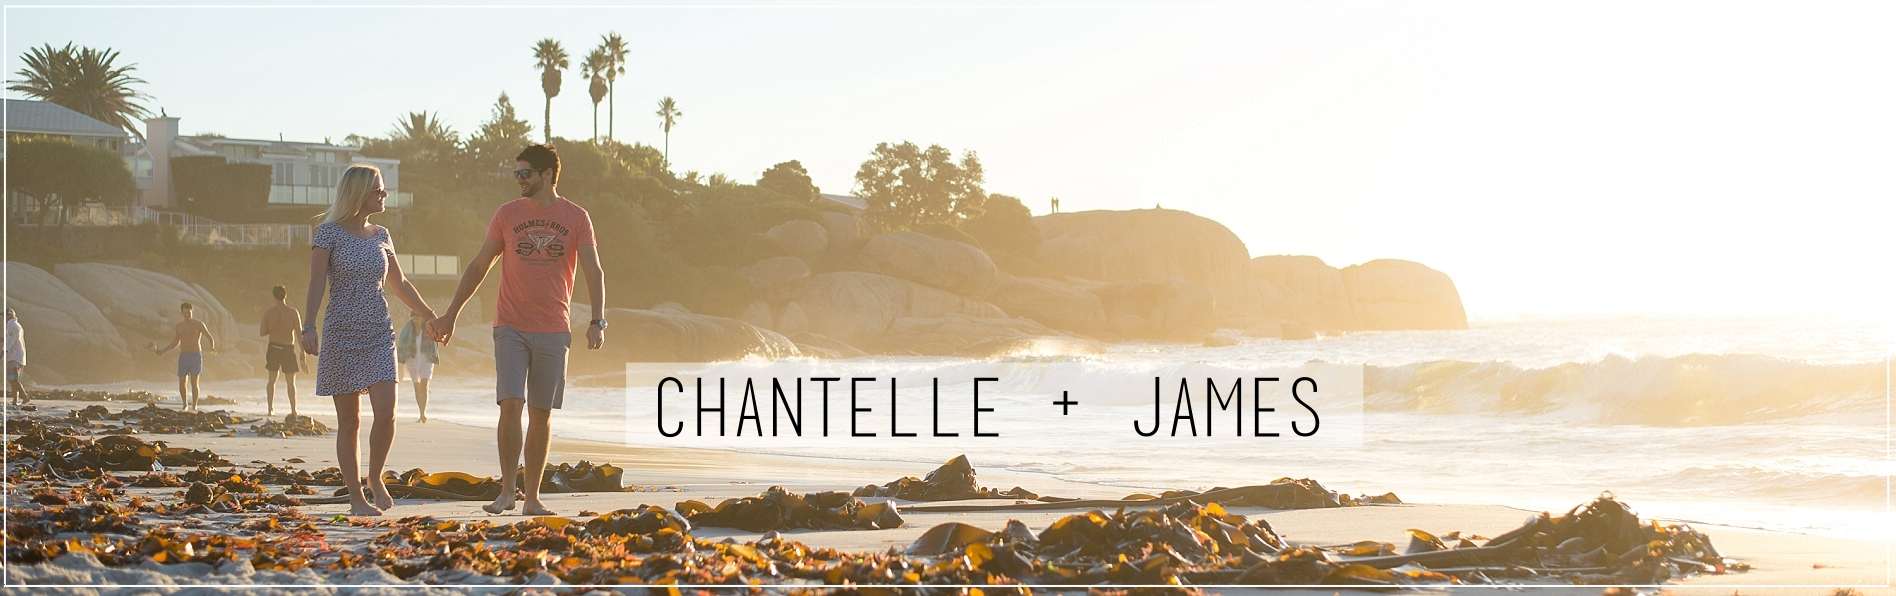 Darren Bester Photography - Cape Town - Chantelle and James_0001.jpg